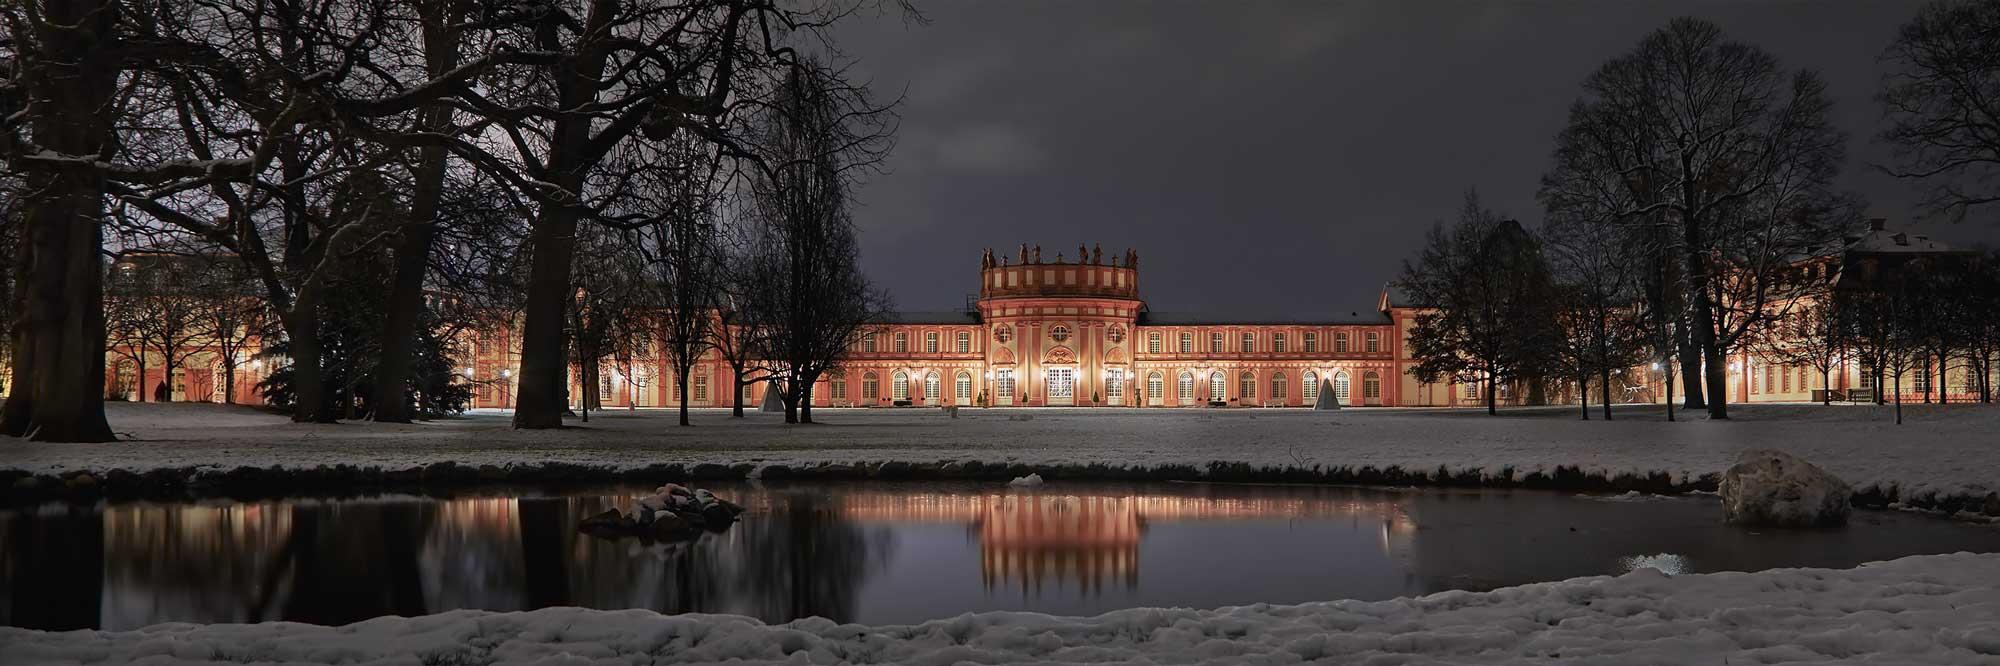 02-Wiesbaden-Biebricher-Schloss-5or4